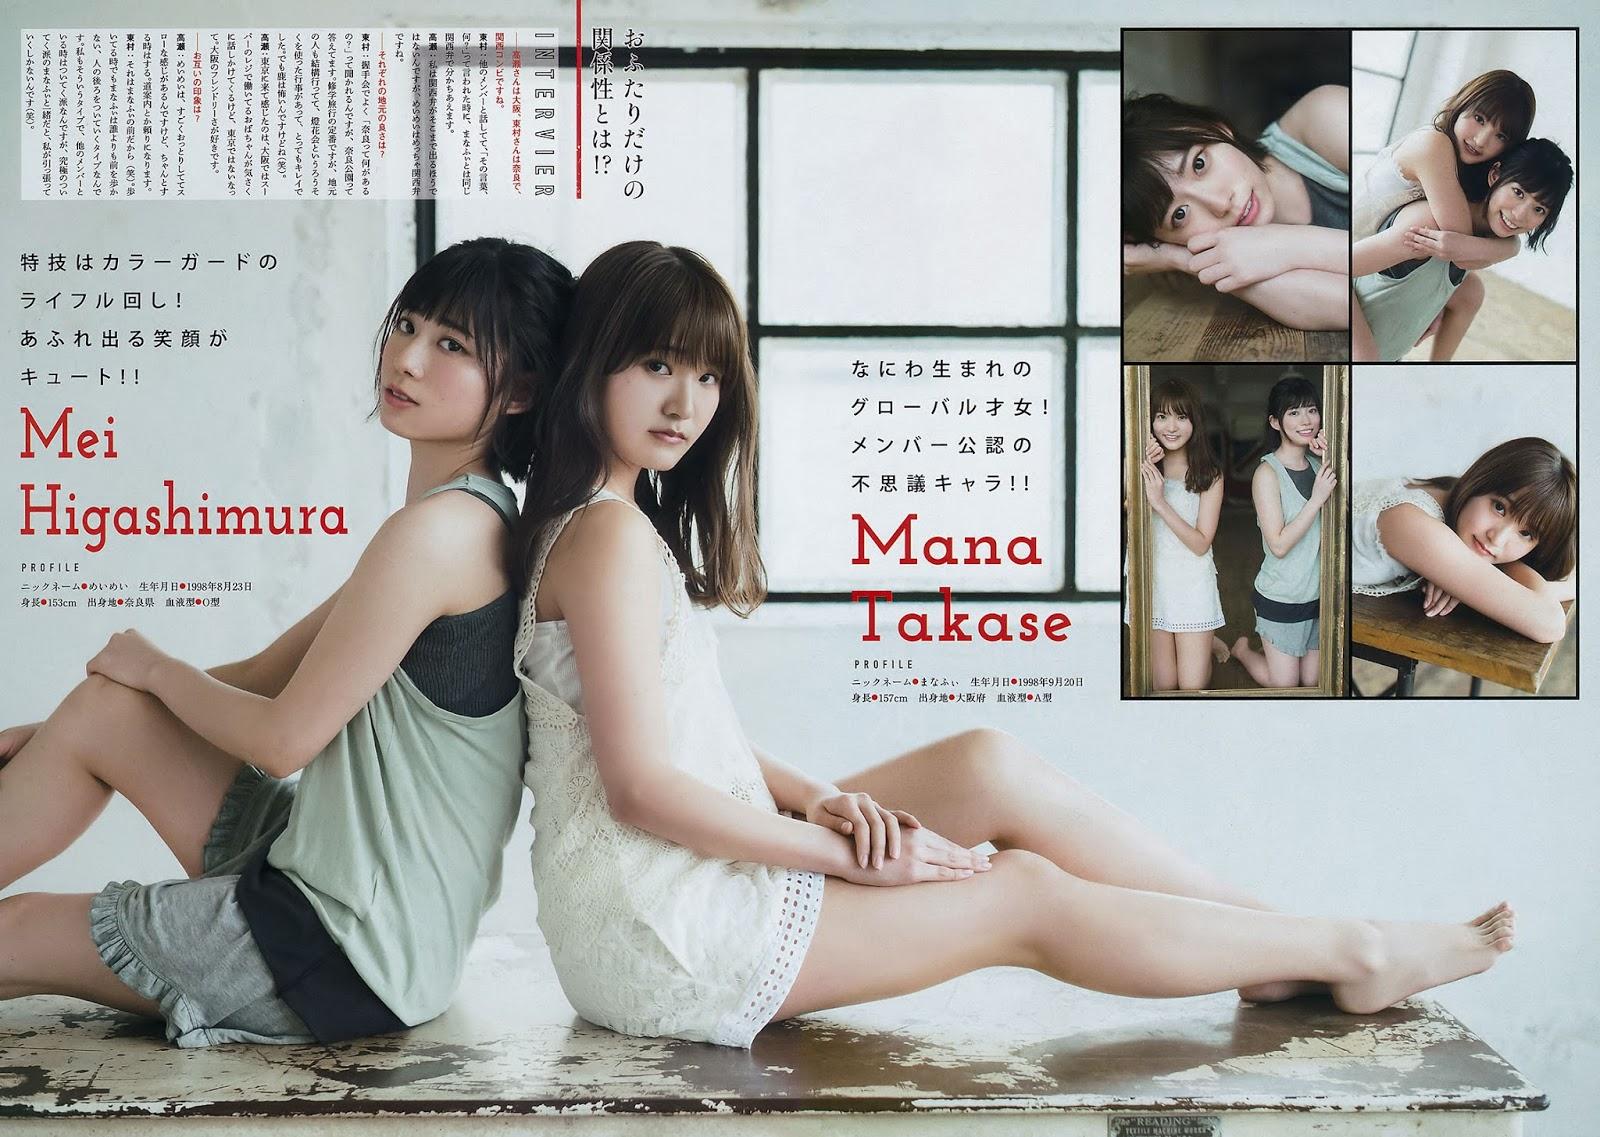 Takase Mana 高瀬愛奈, Higashimura Mei 東村芽依, Young Magazine 2018 No.19 (週刊ヤングマガジン 2018年19号)